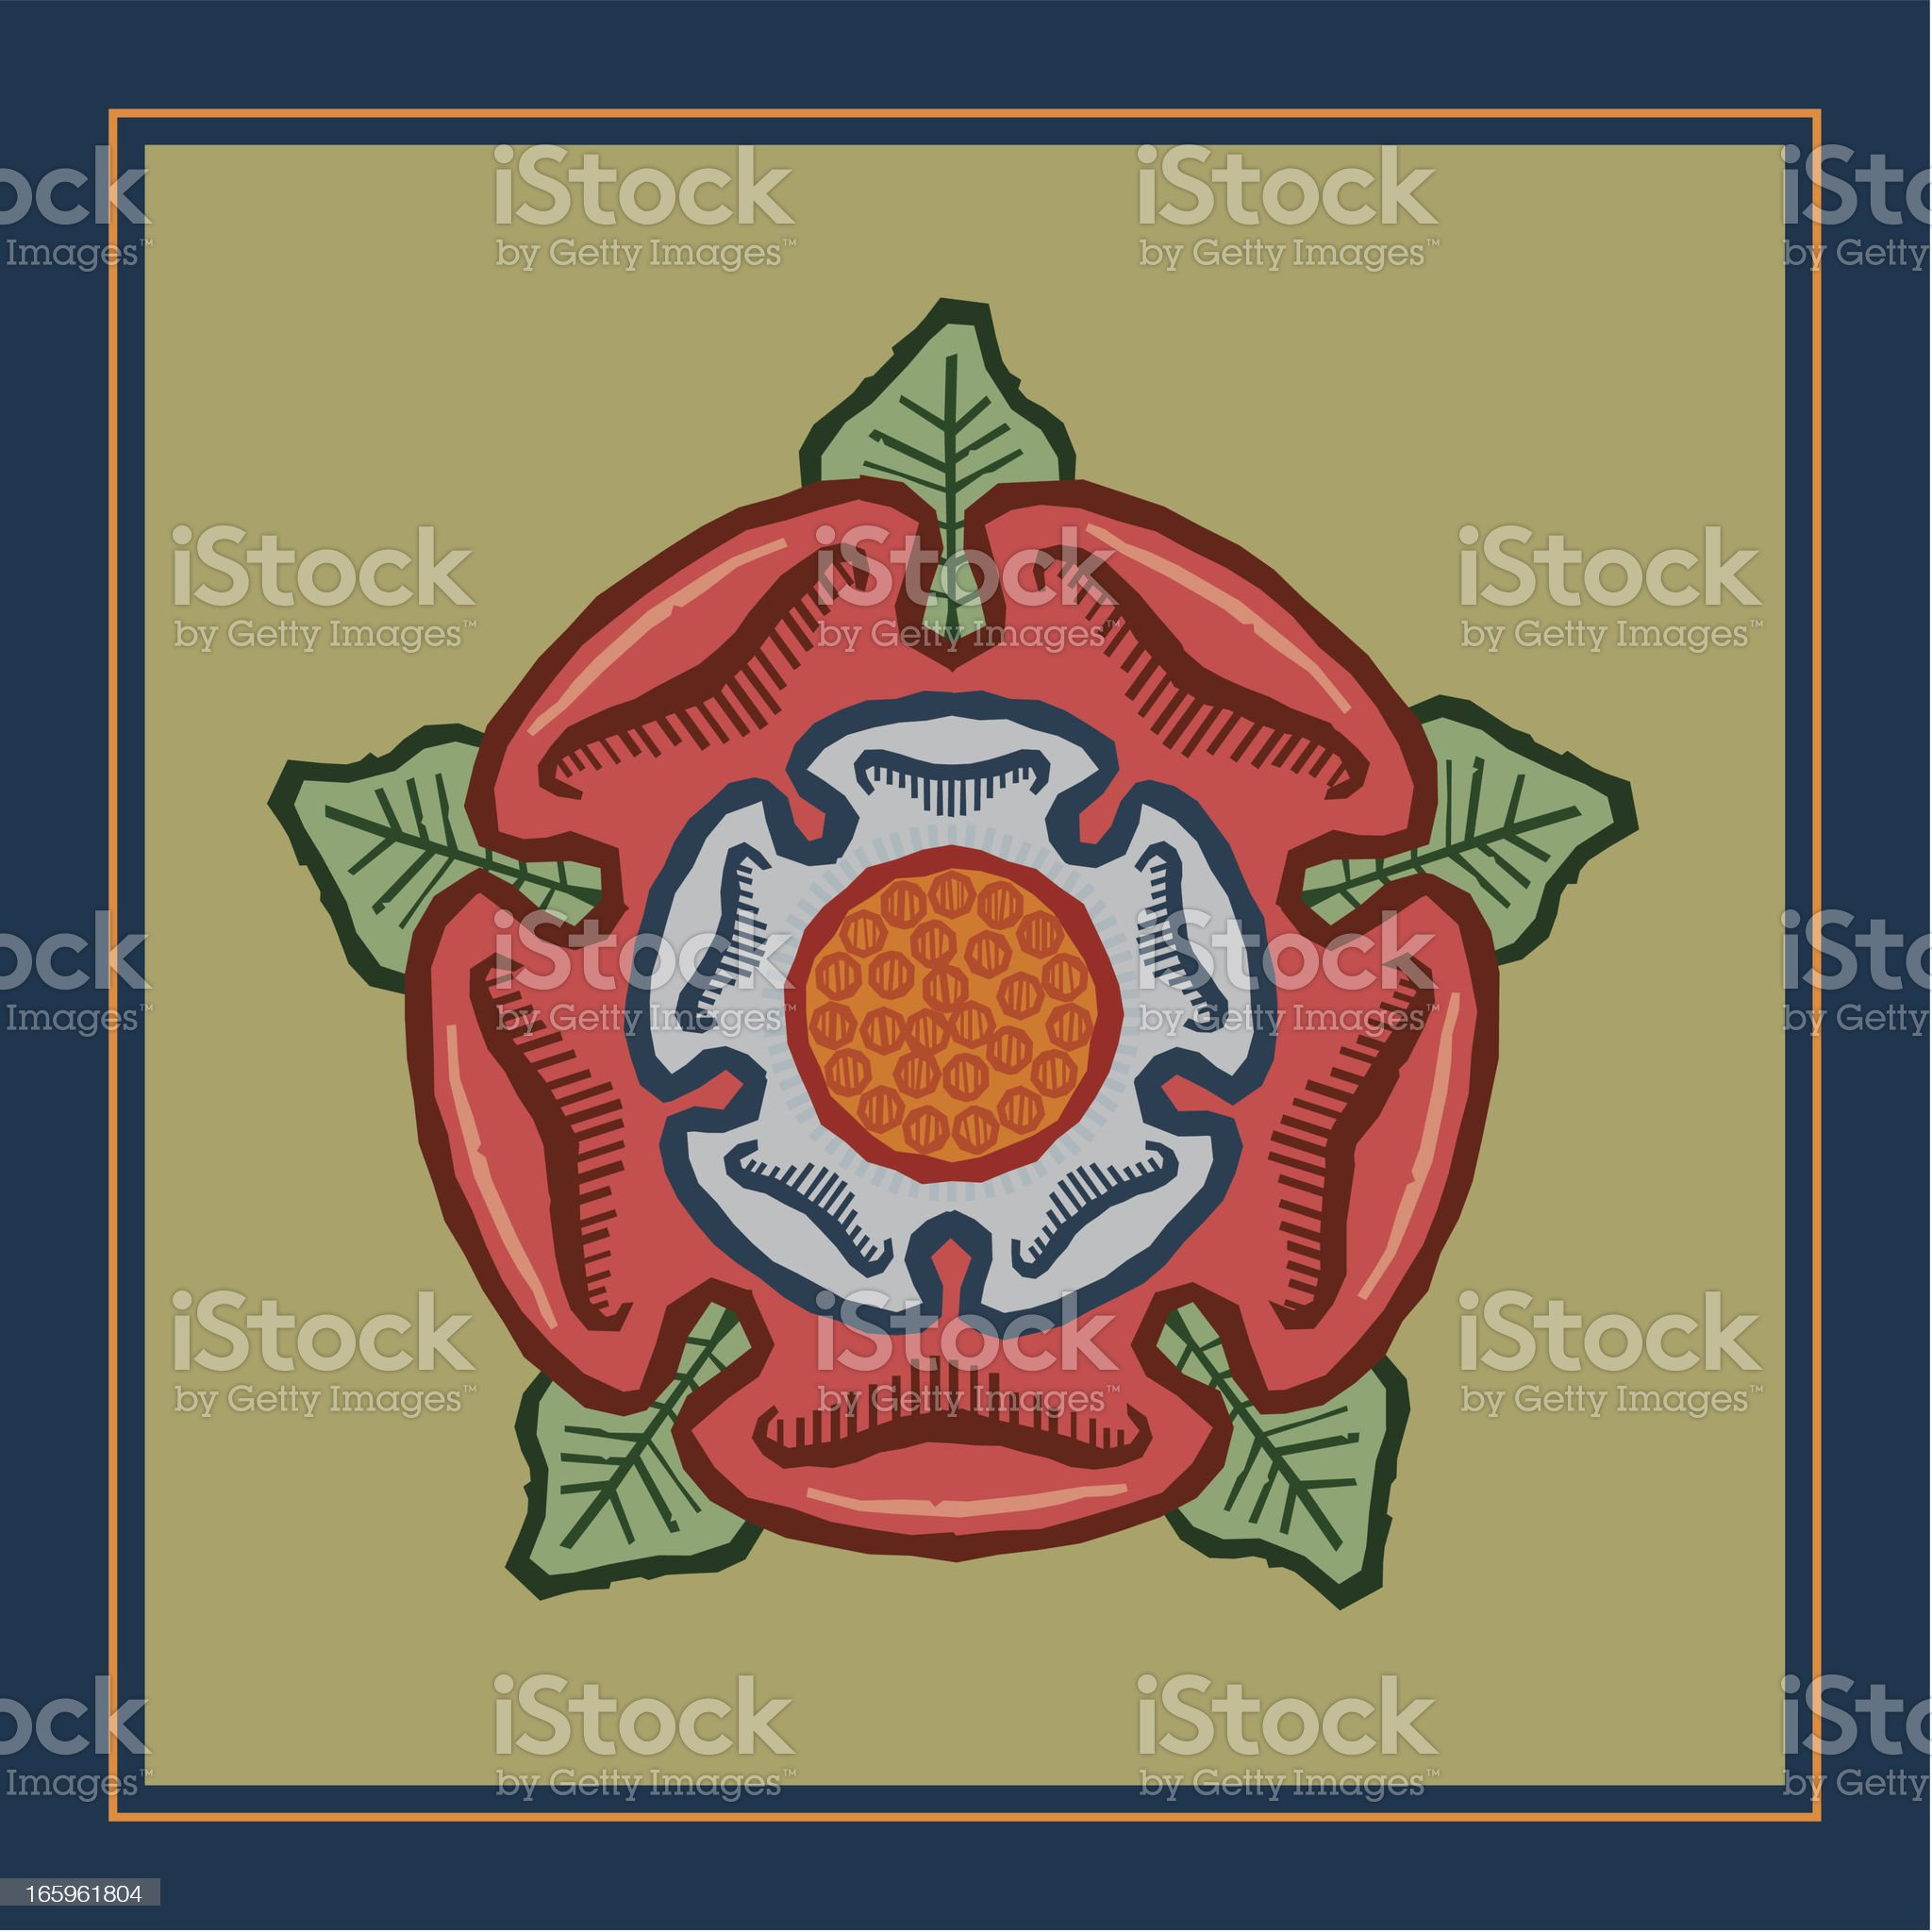 Rose Pub Sign royalty-free stock vector art